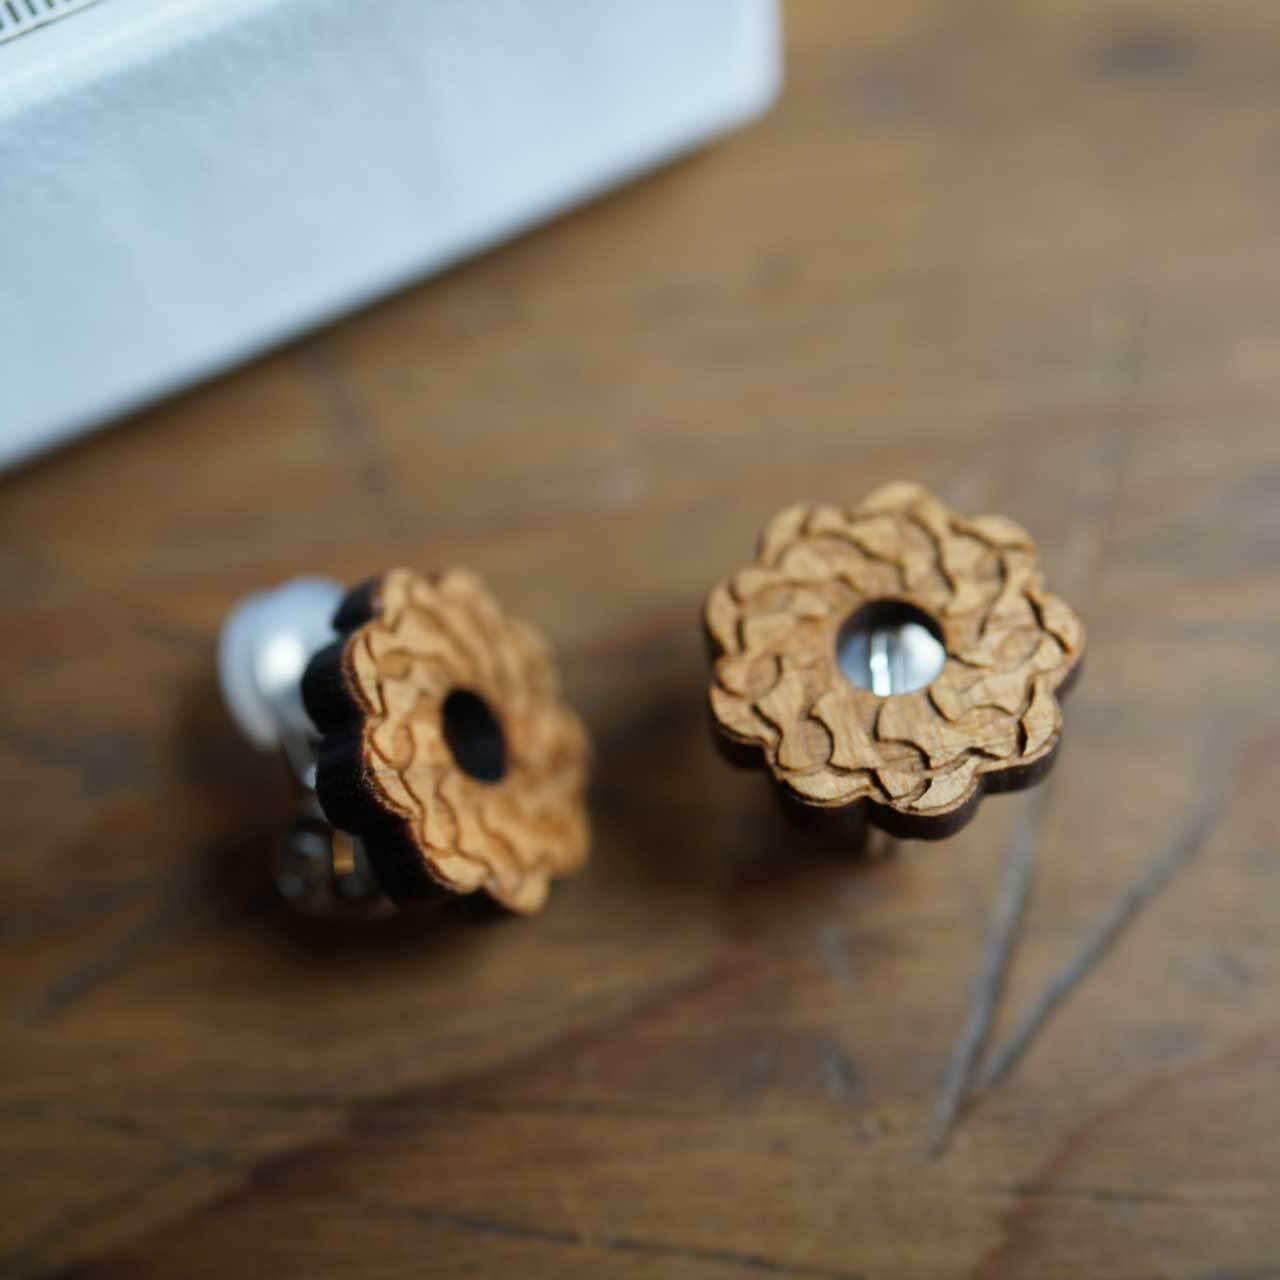 round and round / ぐるぐる(Pierced Earring)